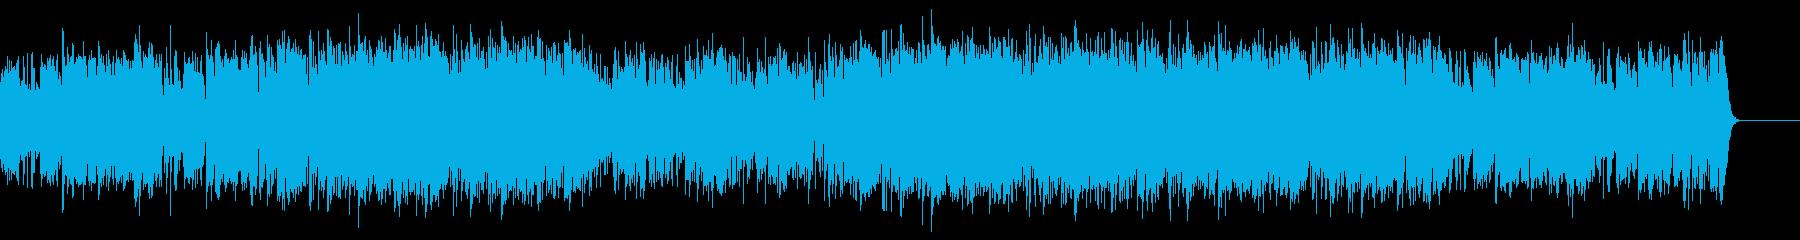 Youtube・大人な夏の海・ジャズ の再生済みの波形